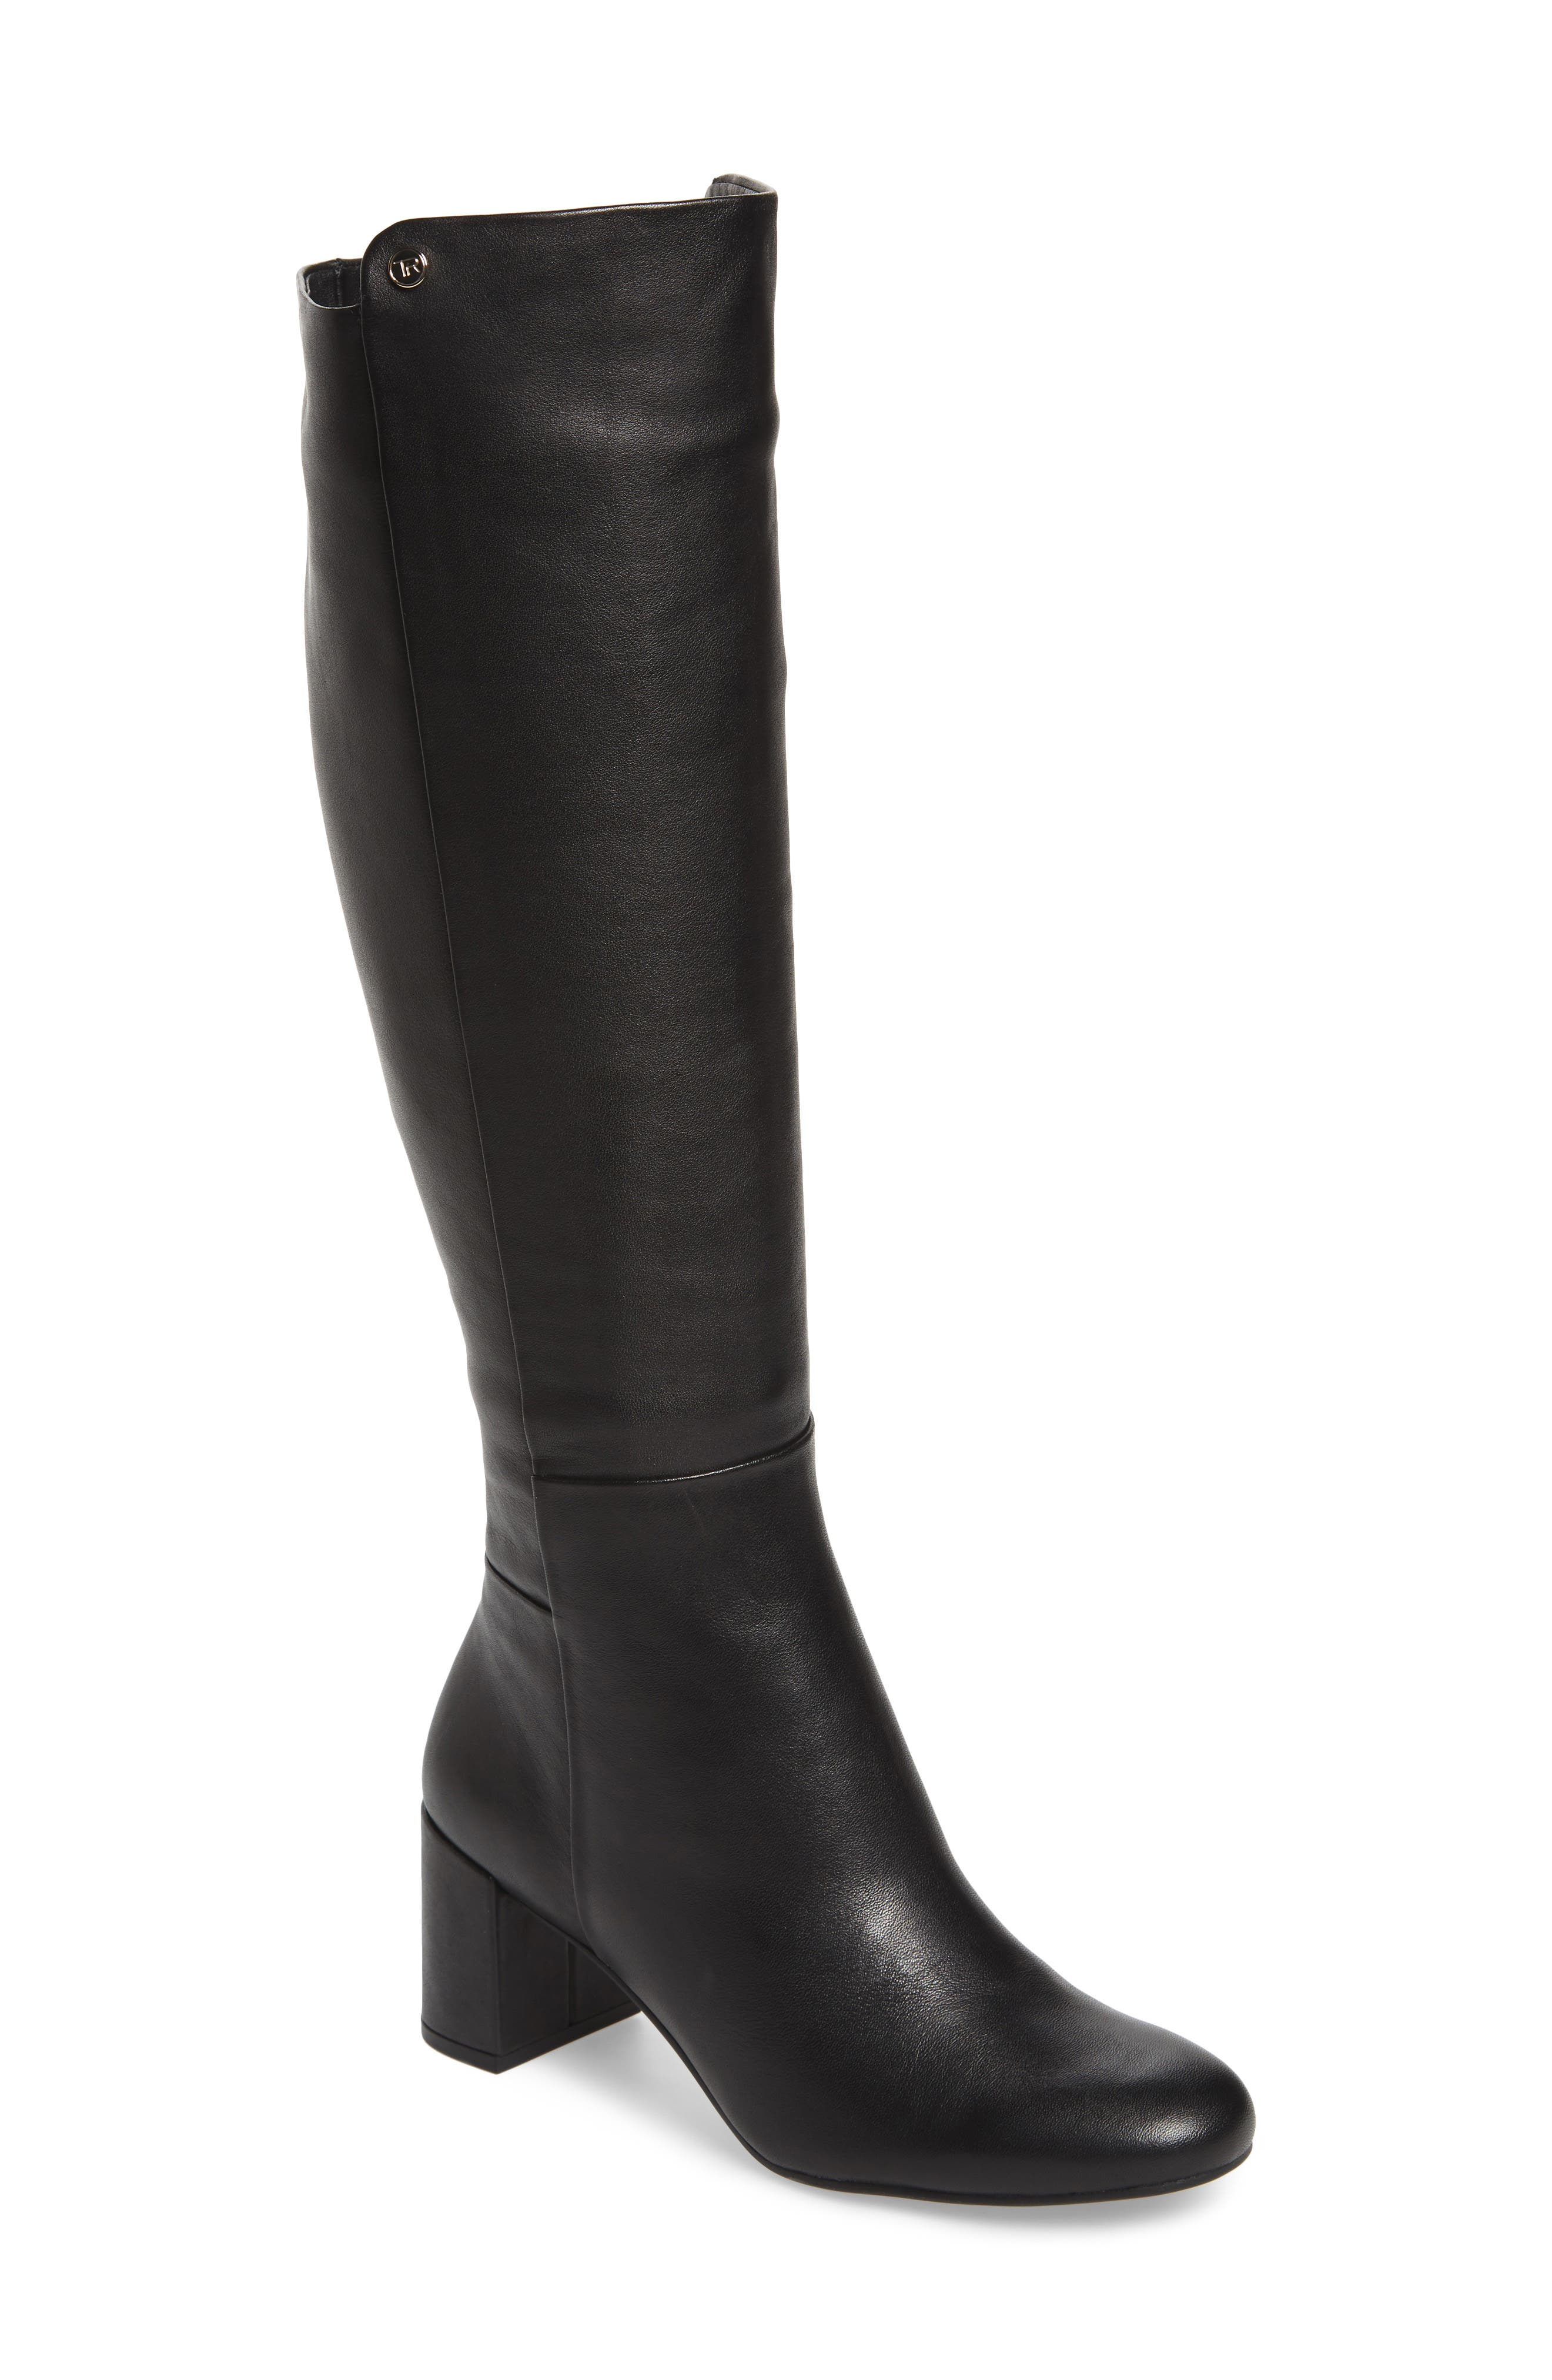 Alternate Image 1 Selected - Taryn Rose Carolyn Tall Boot (Women)